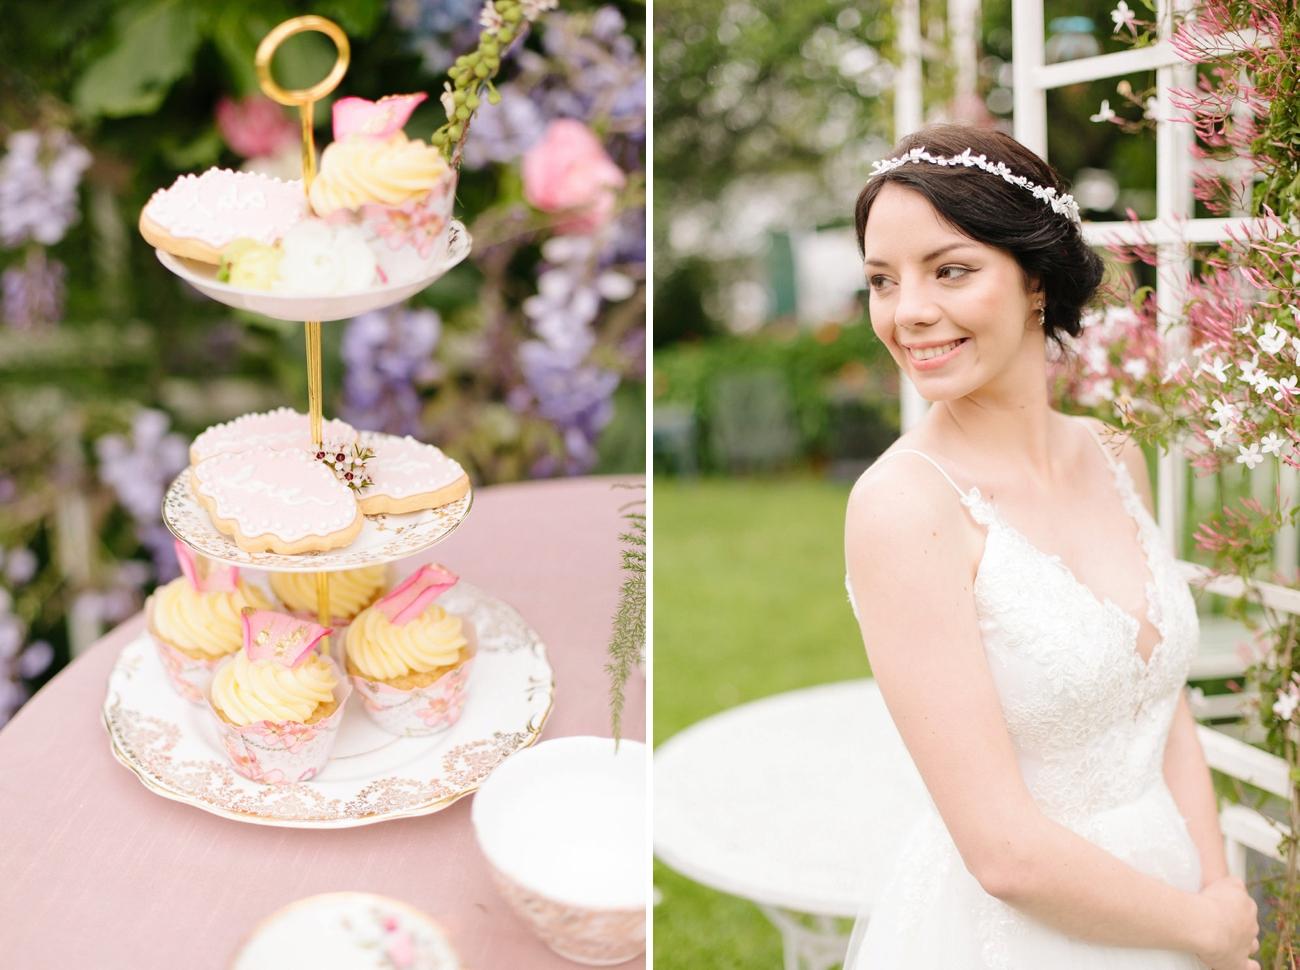 Spring Garden Wedding Inspiration | Image: Nelani Van Zyl